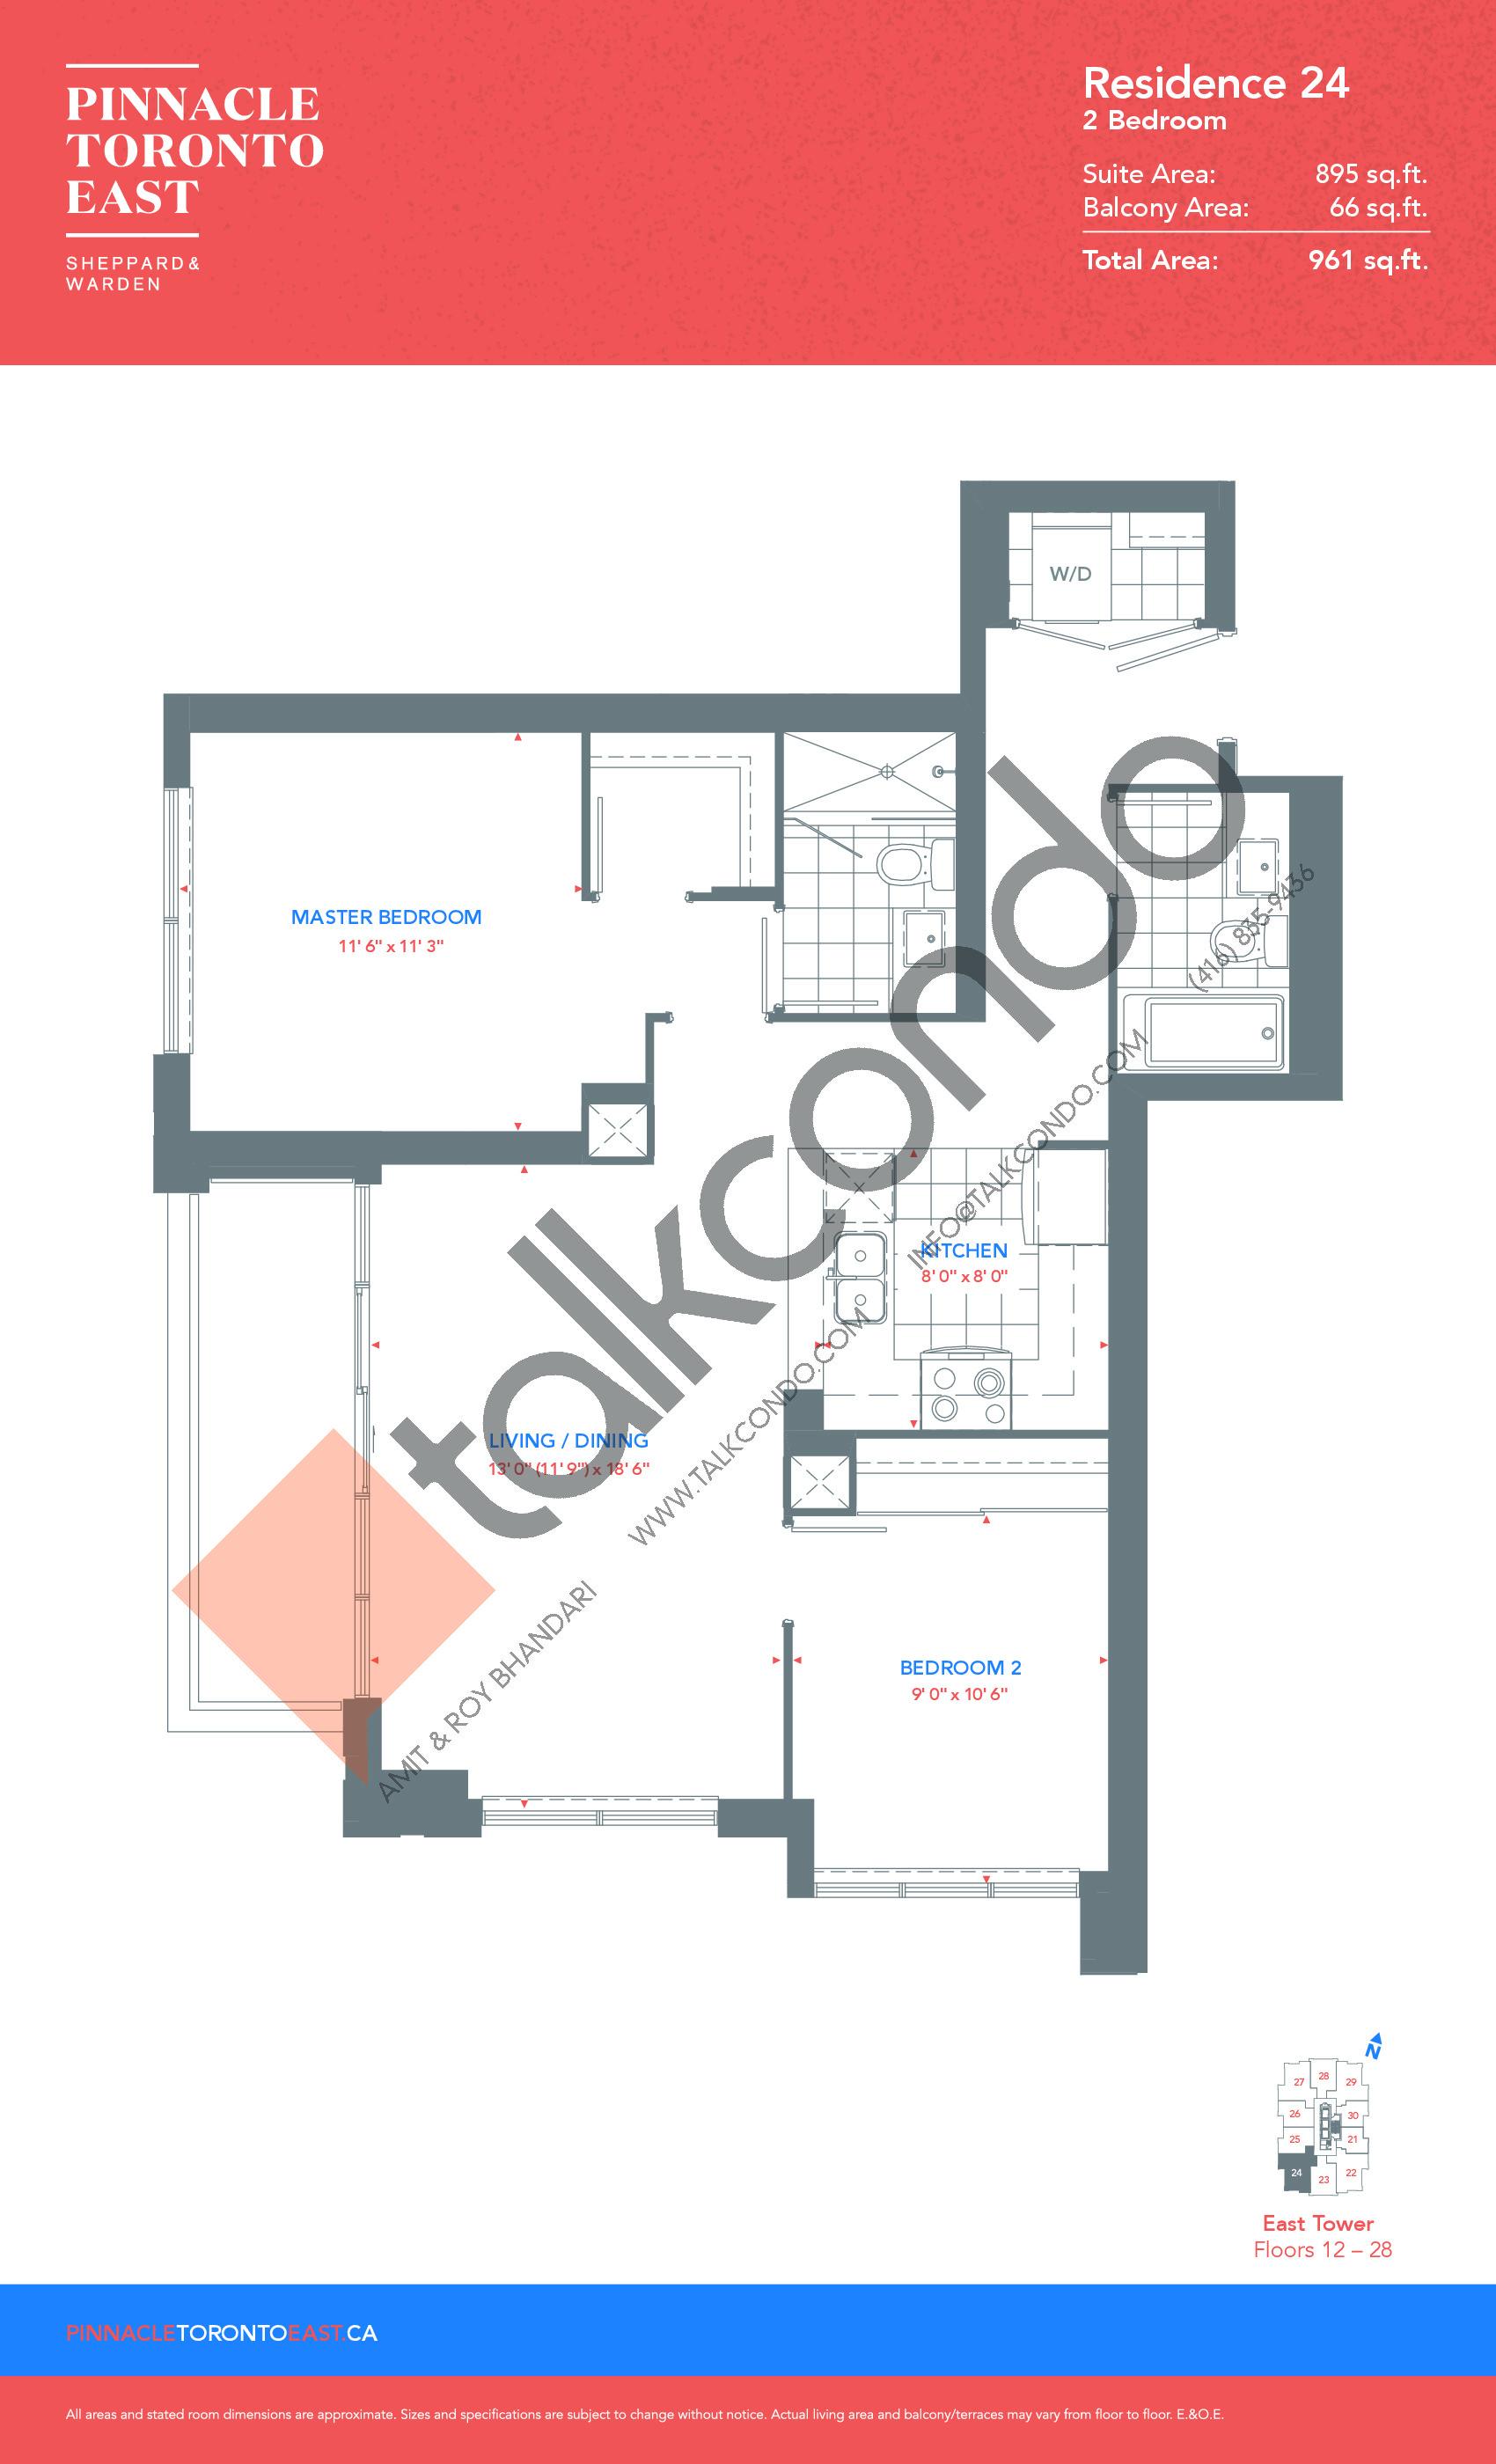 Residence 24 - East Tower Floor Plan at Pinnacle Toronto East Condos - 895 sq.ft